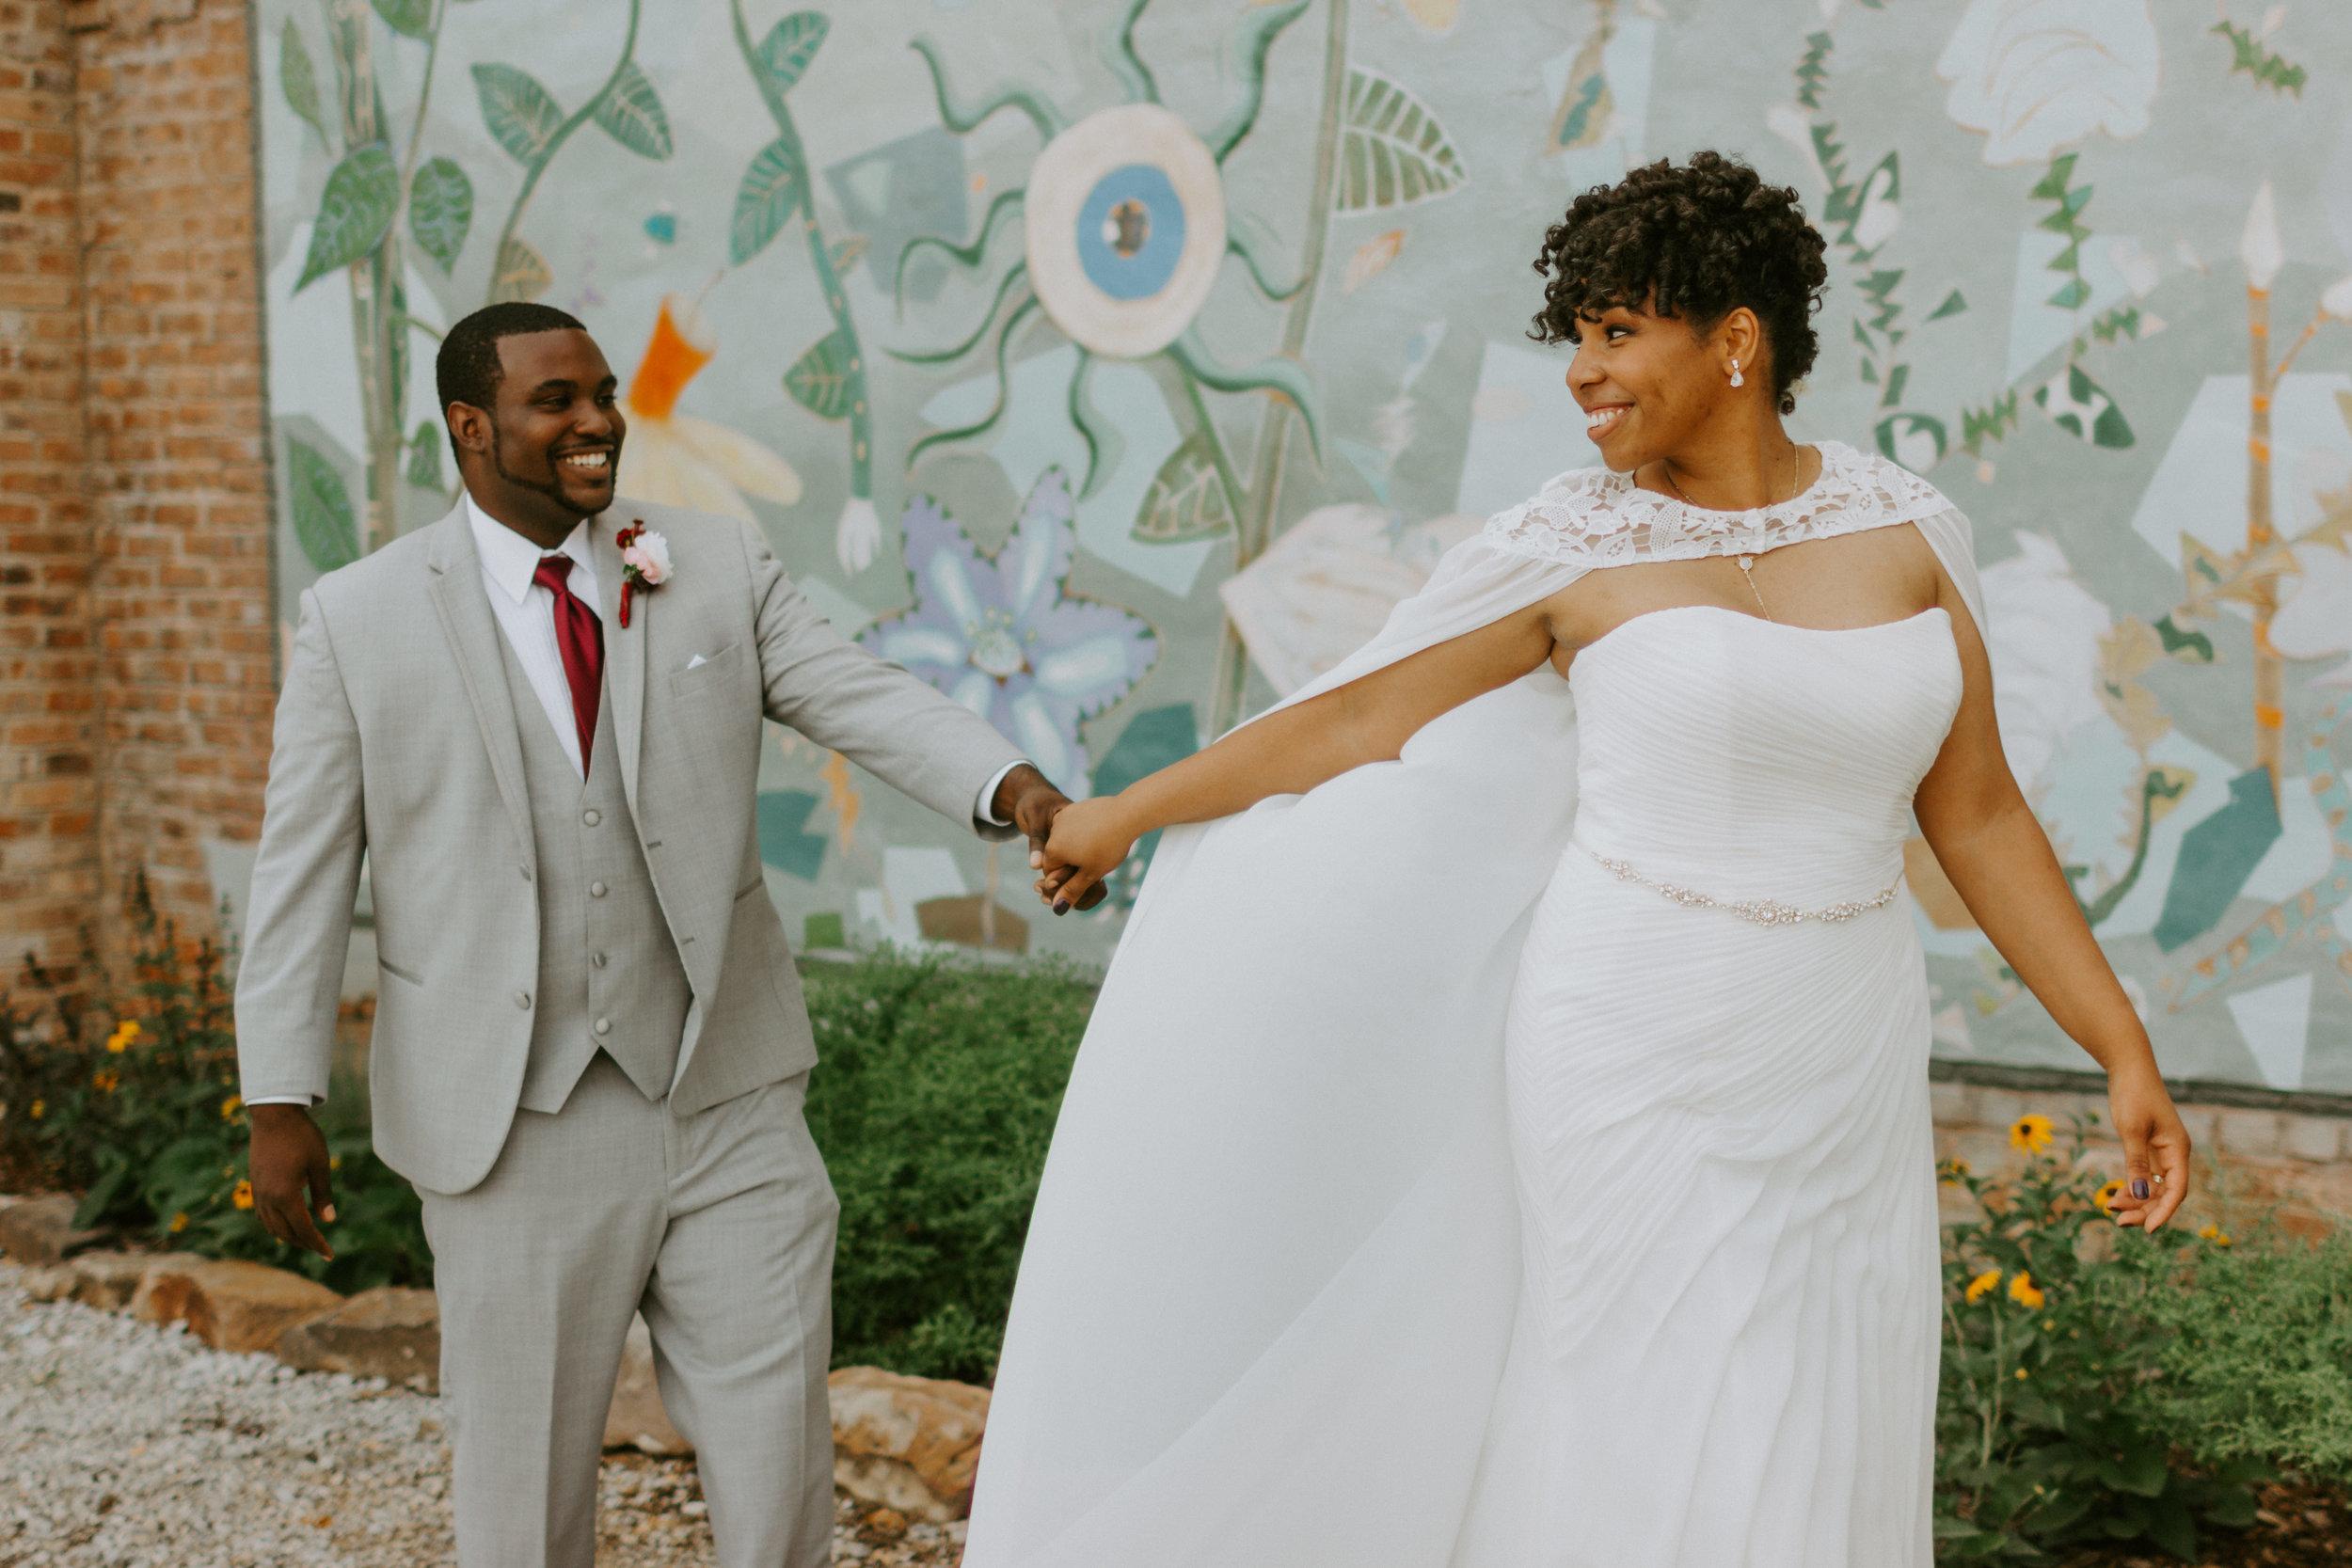 WonderlyCreative_Wedding_6.7.18_Khara&Dwayne_-753.jpg